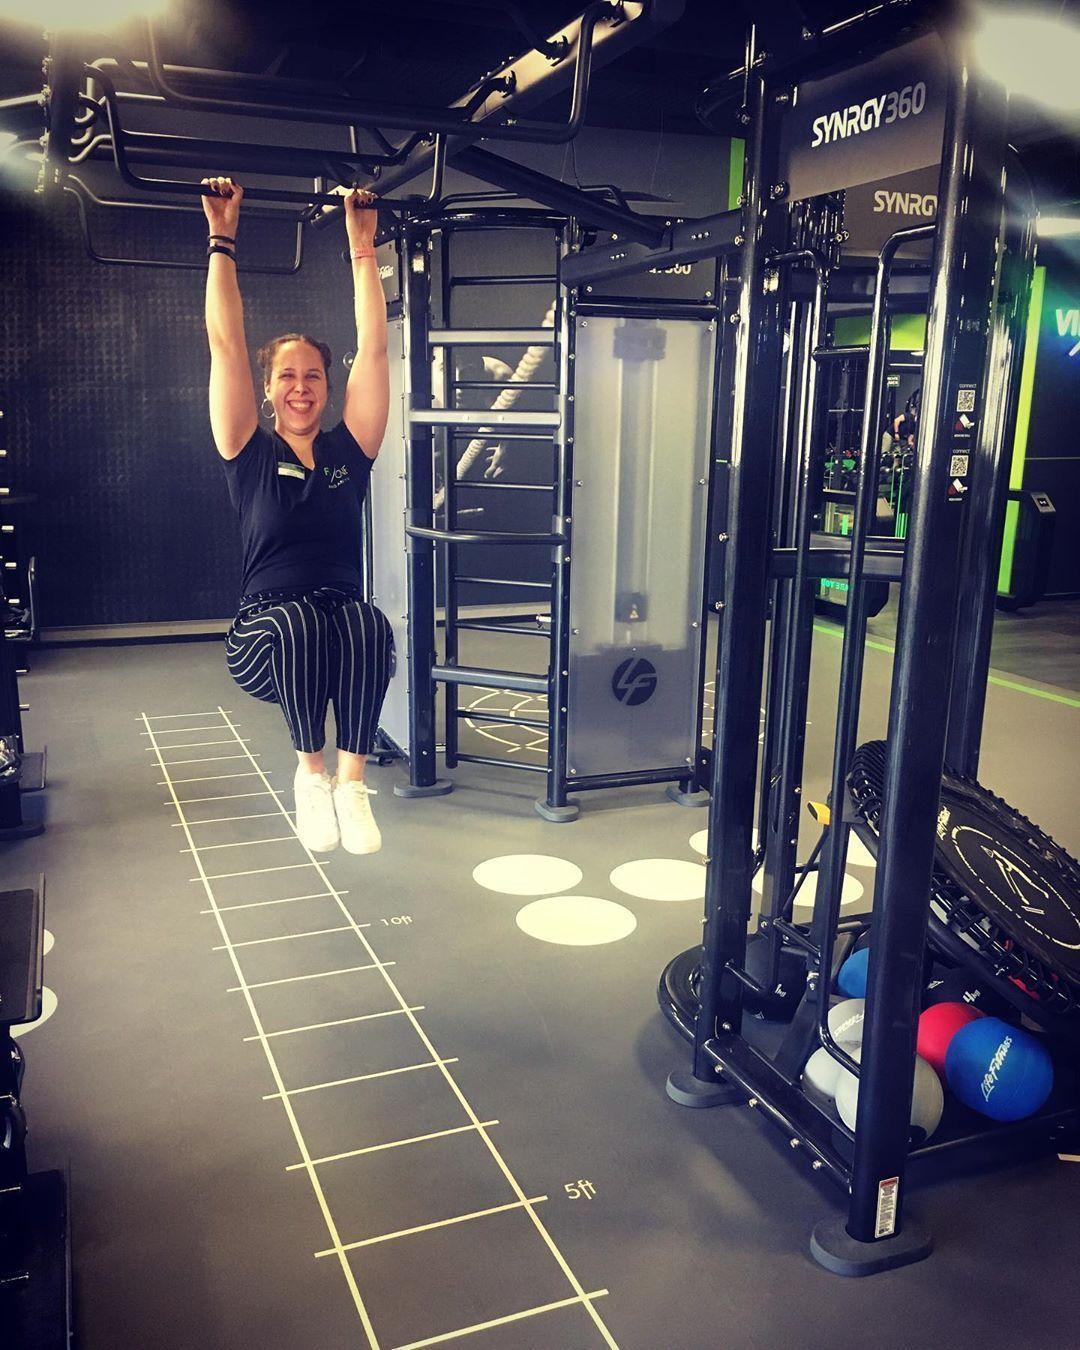 #Decor #Fragen #Functiona #Home #Pictures #probetraining fitnessstudio #training #zum (New) The 10 B...